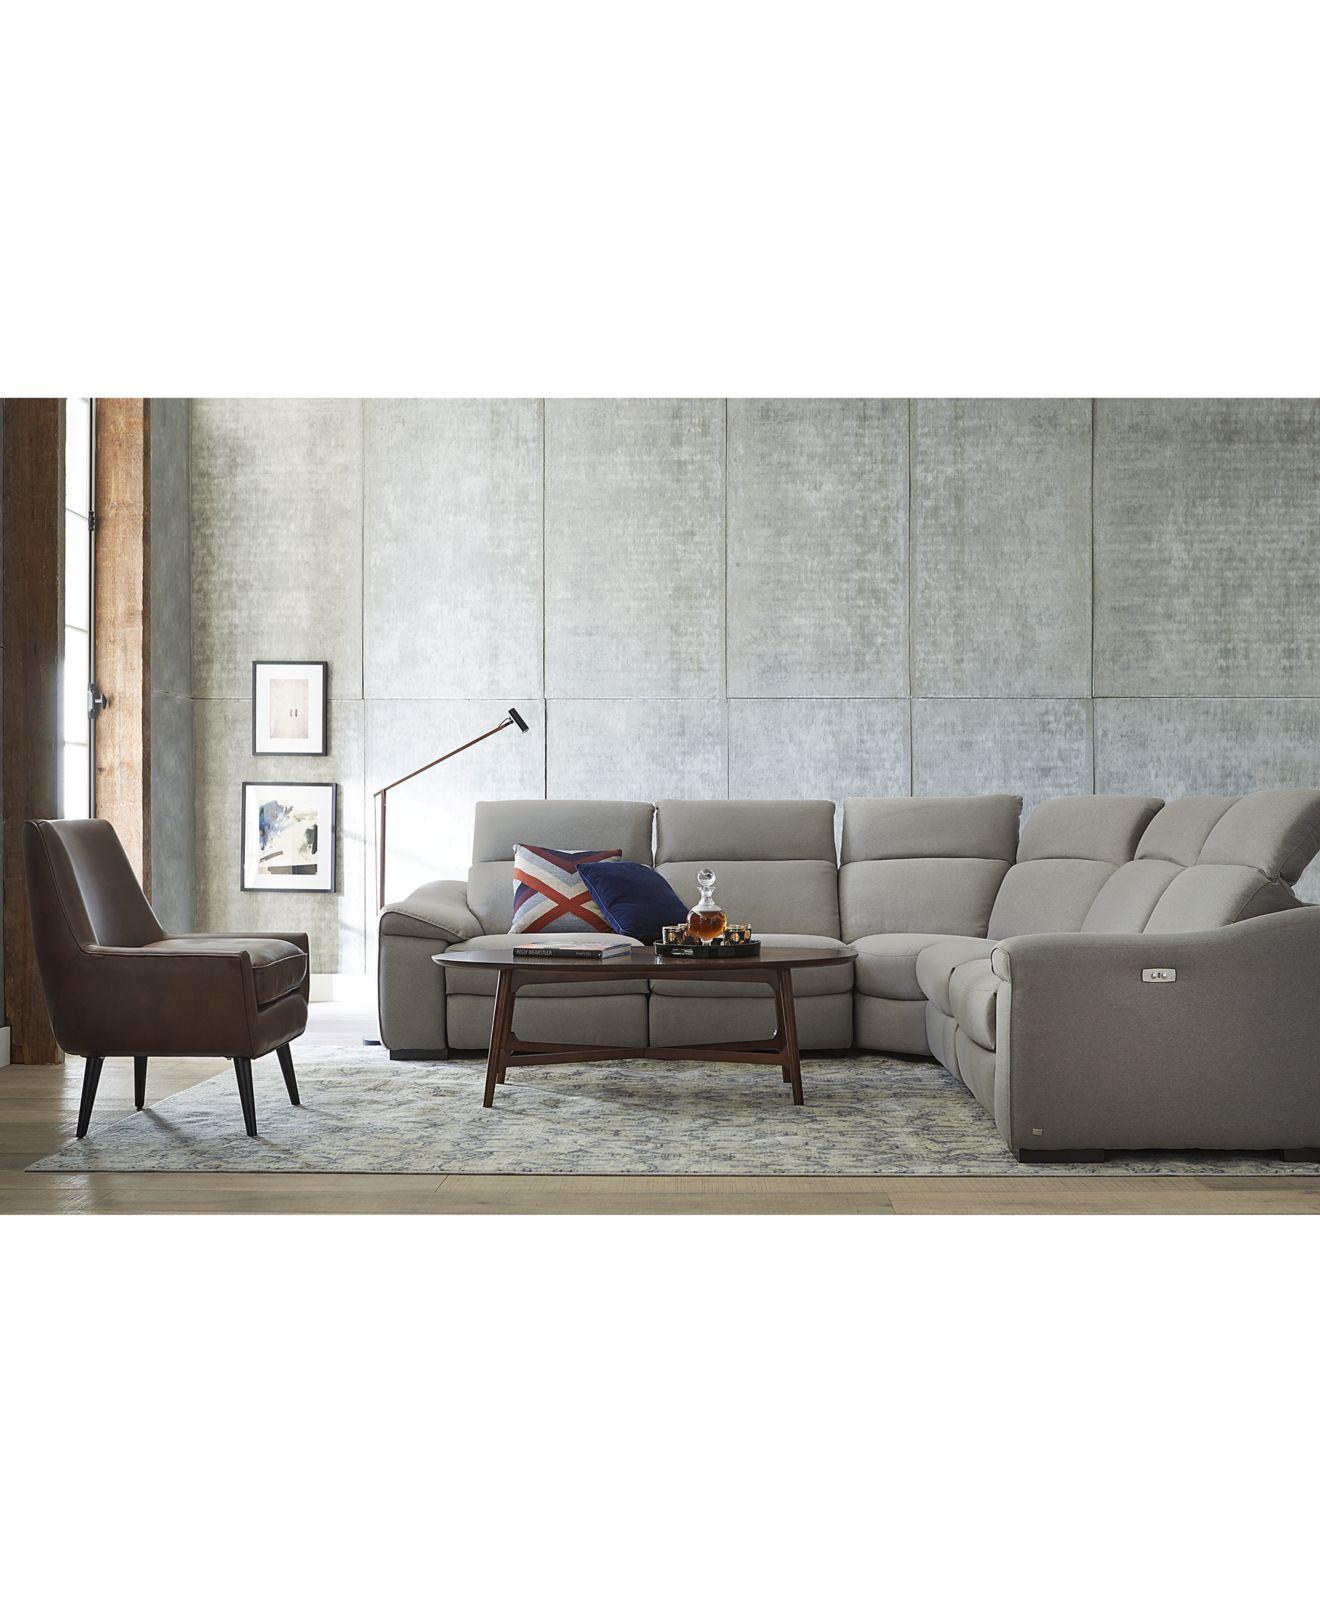 Macys Sectional Sofas hmmi